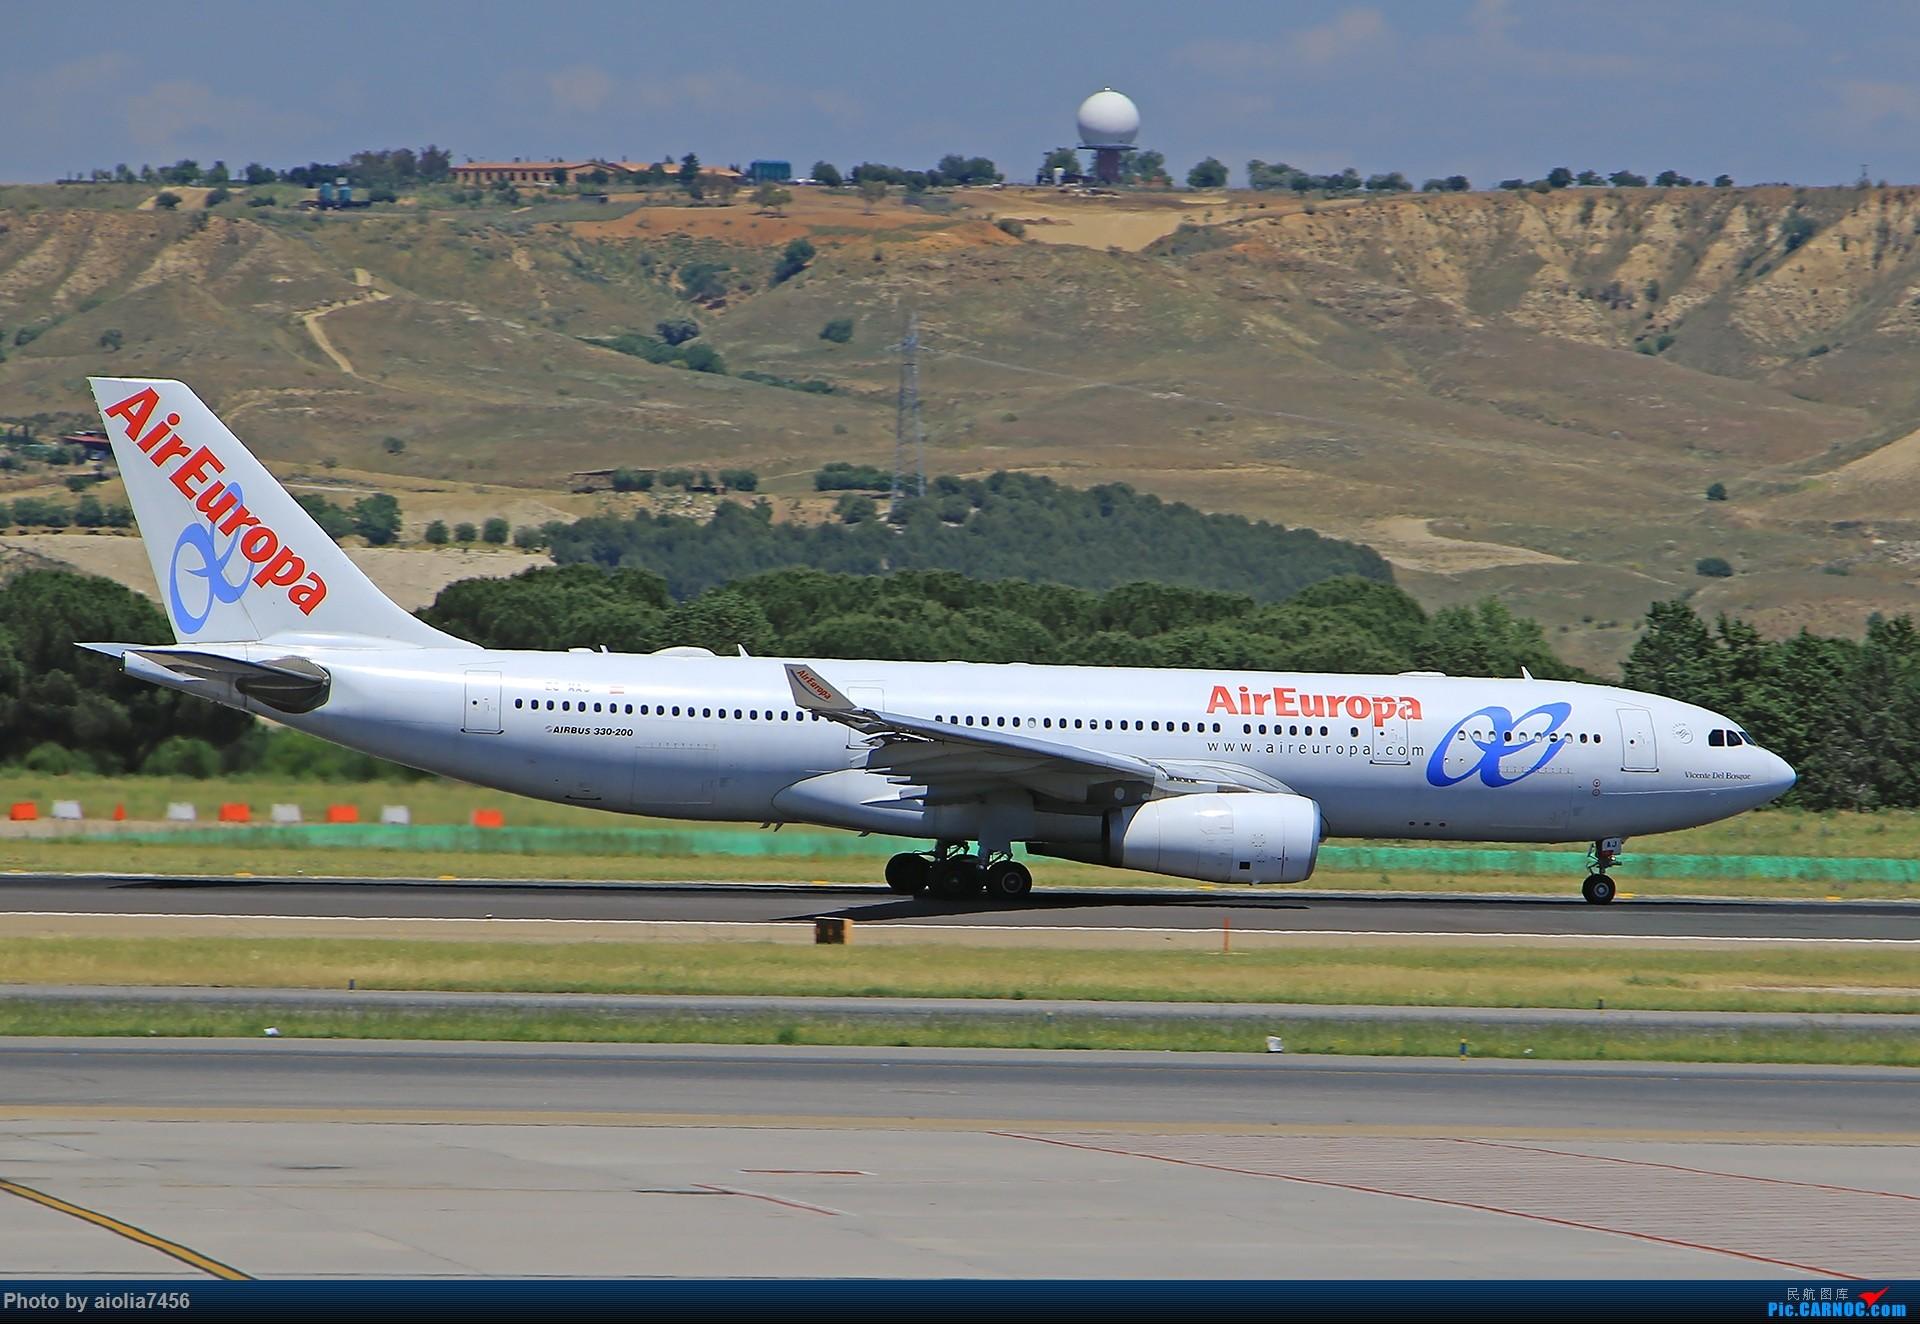 Re:[原创]【合肥飞友会】西行归来第二弹--西行拍机 AIRBUS A330-200 EC-MAJ 西班牙马德里机场